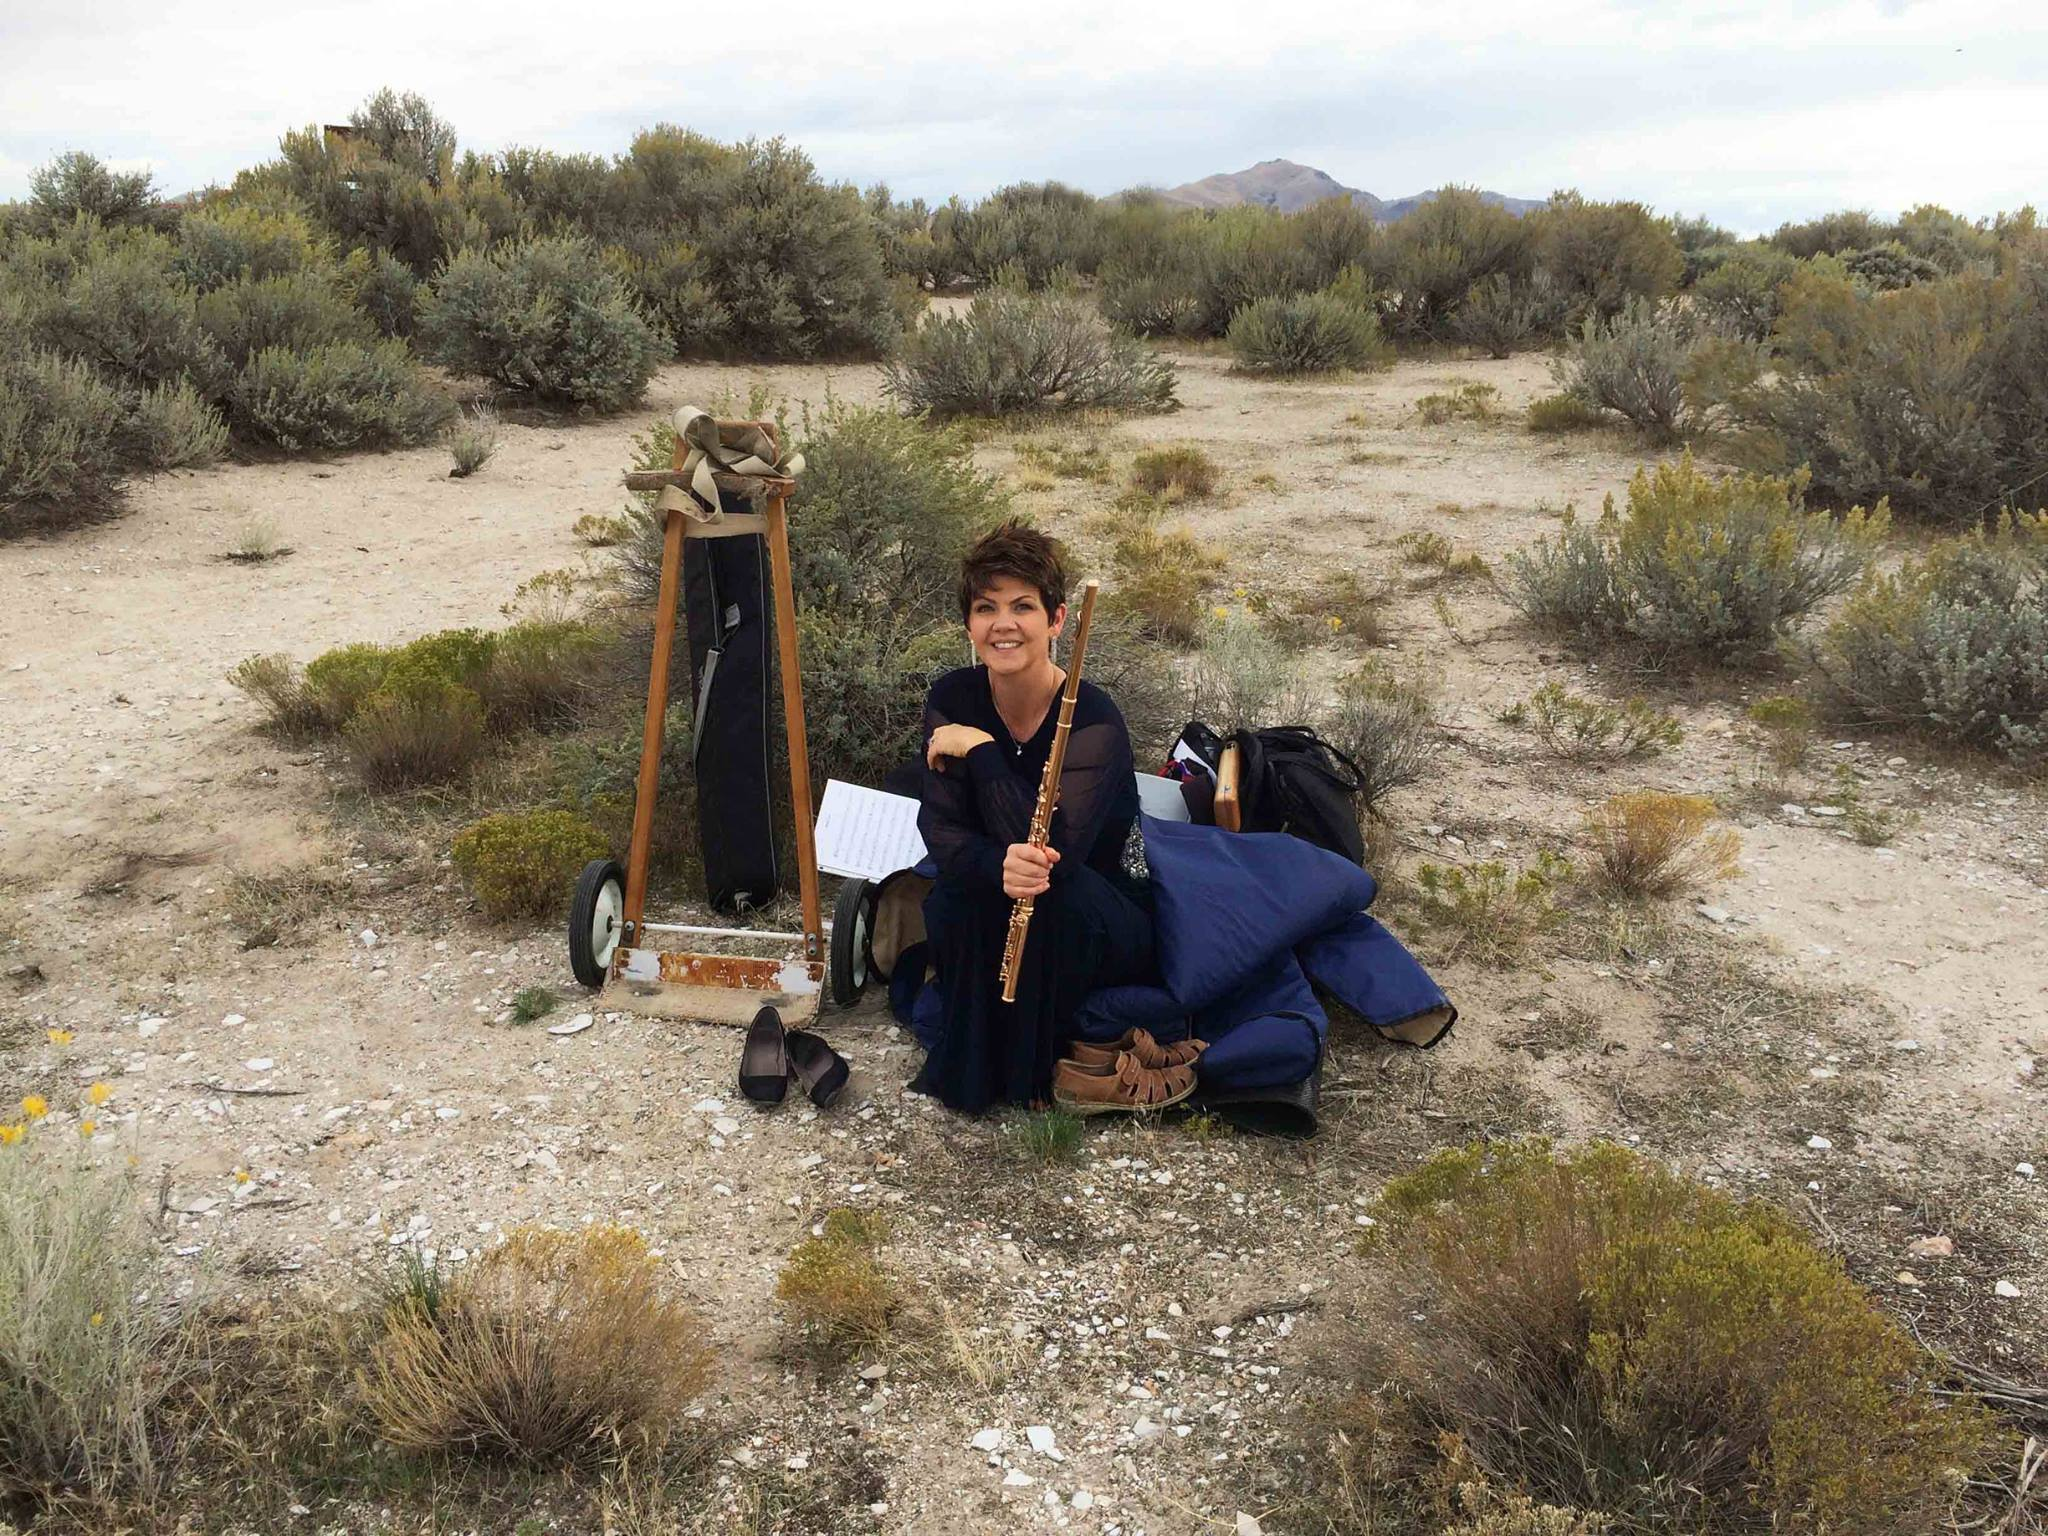 Jeannine Goeckeritz - Flute - Behind the Scenes - Music Video Shoot.jpg